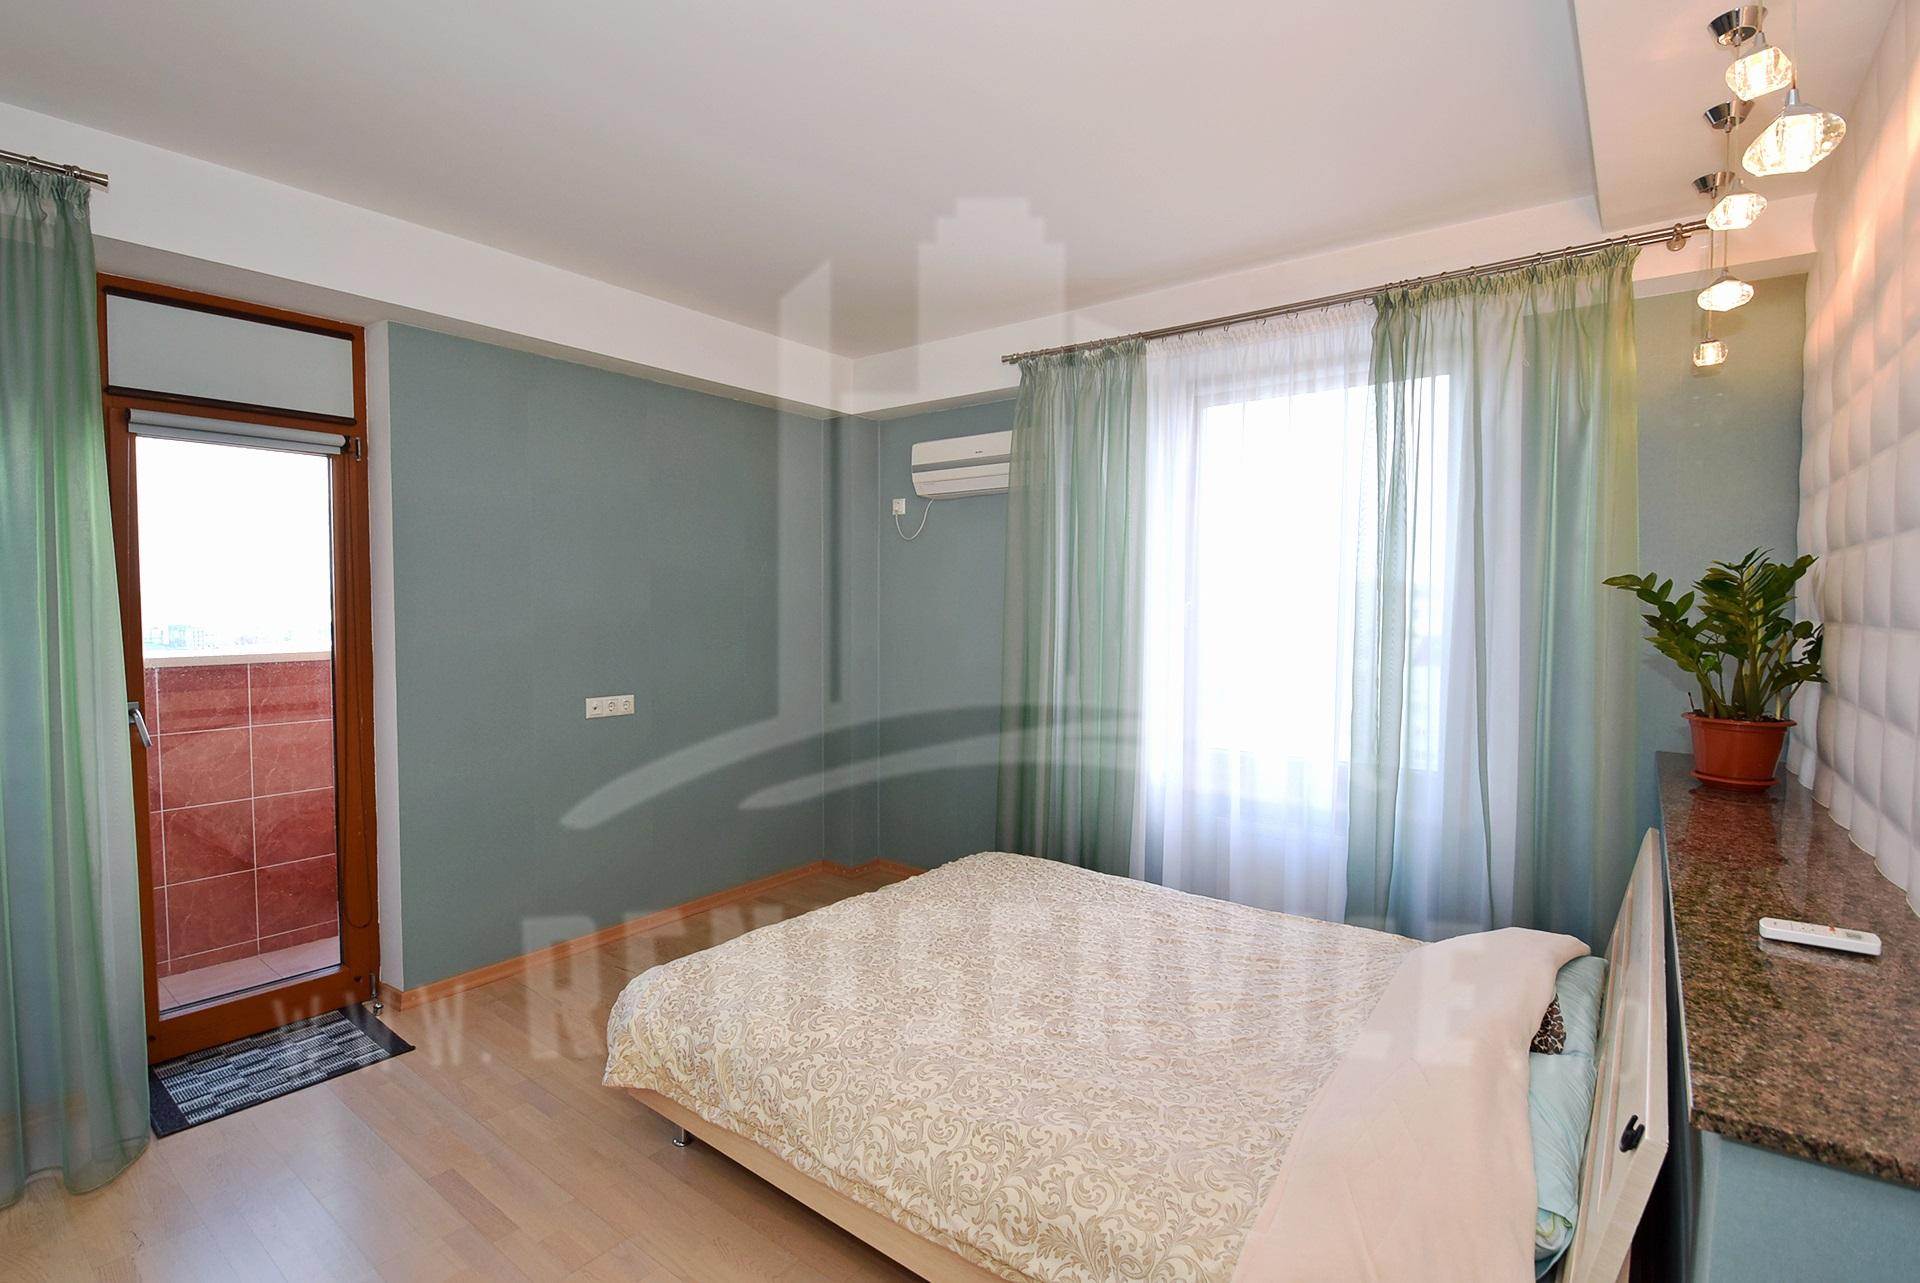 288_apartment_6.JPG